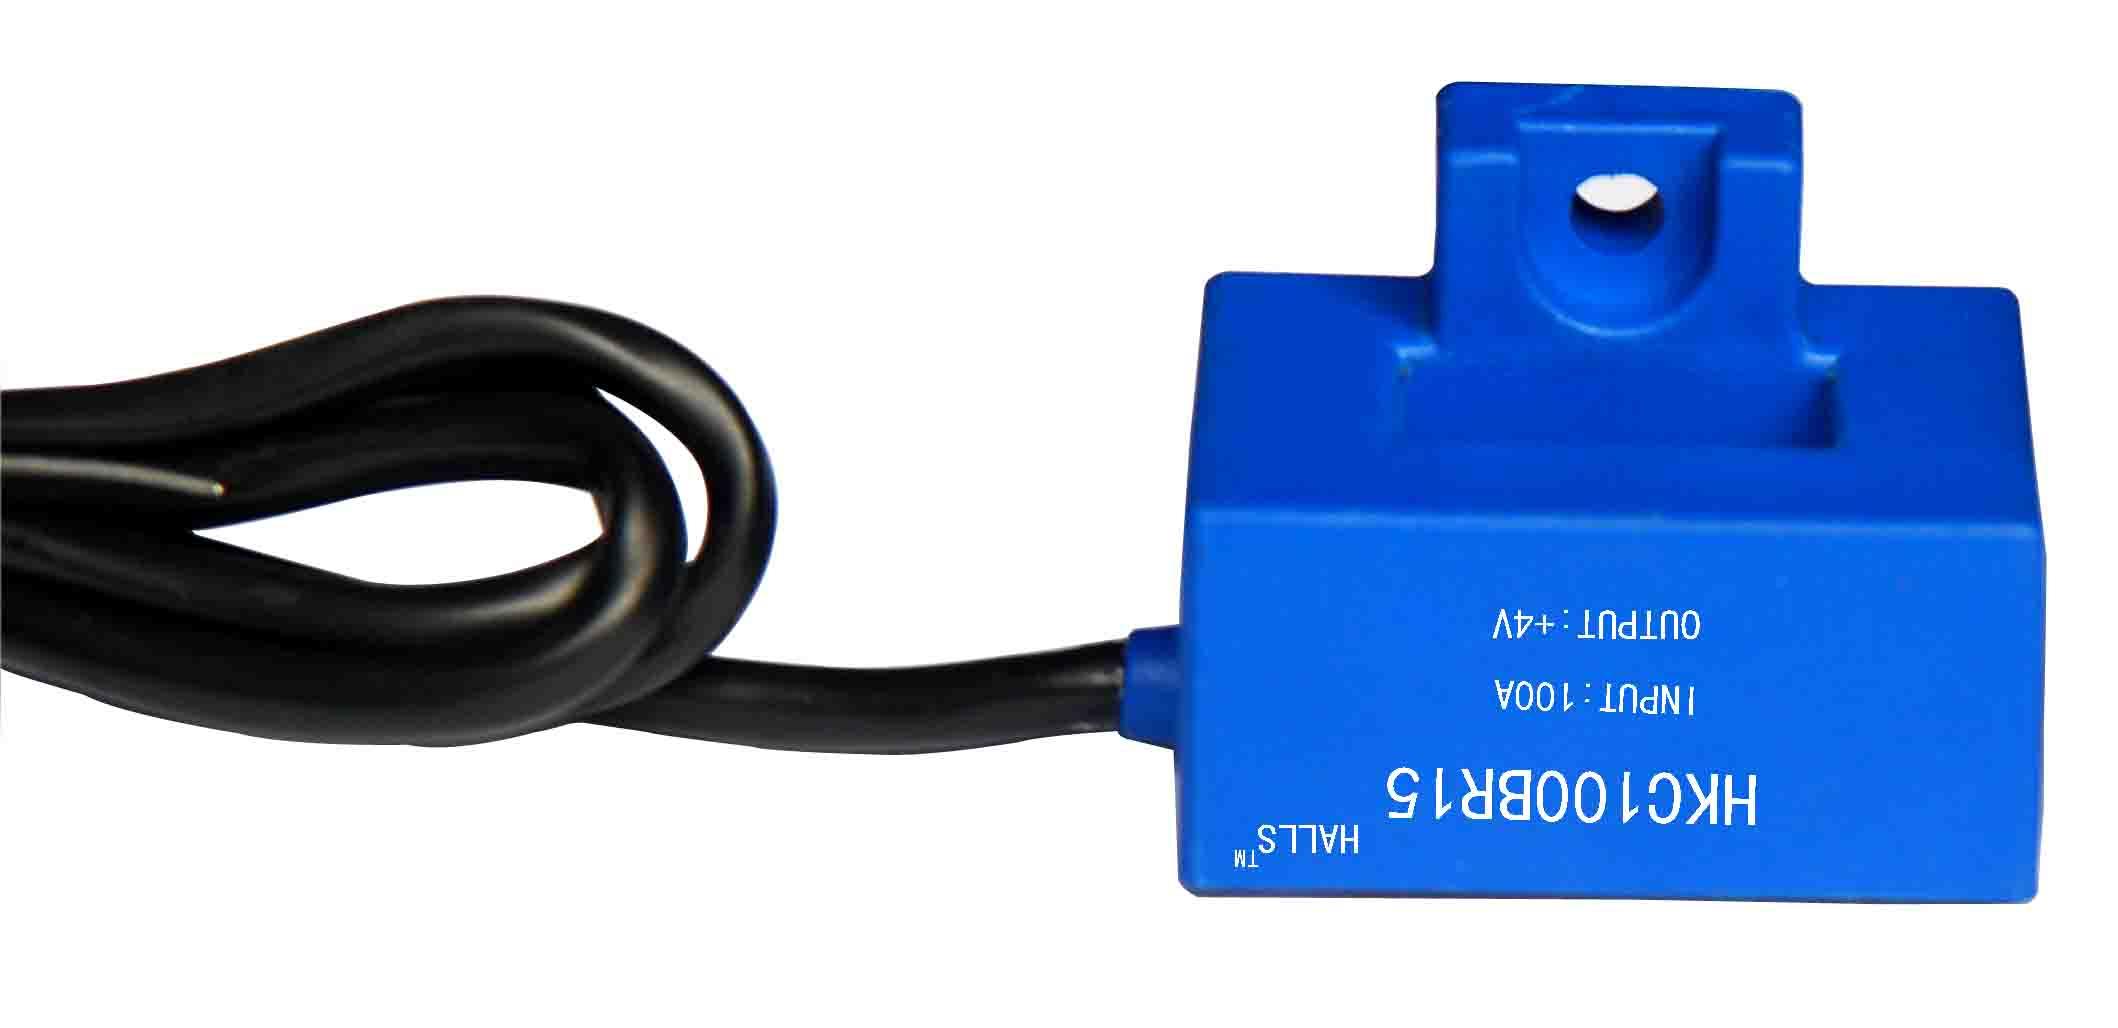 Hall single power supply 12v 18v hkc-bs15 current sensor 50a 100a 600a(China (Mainland))